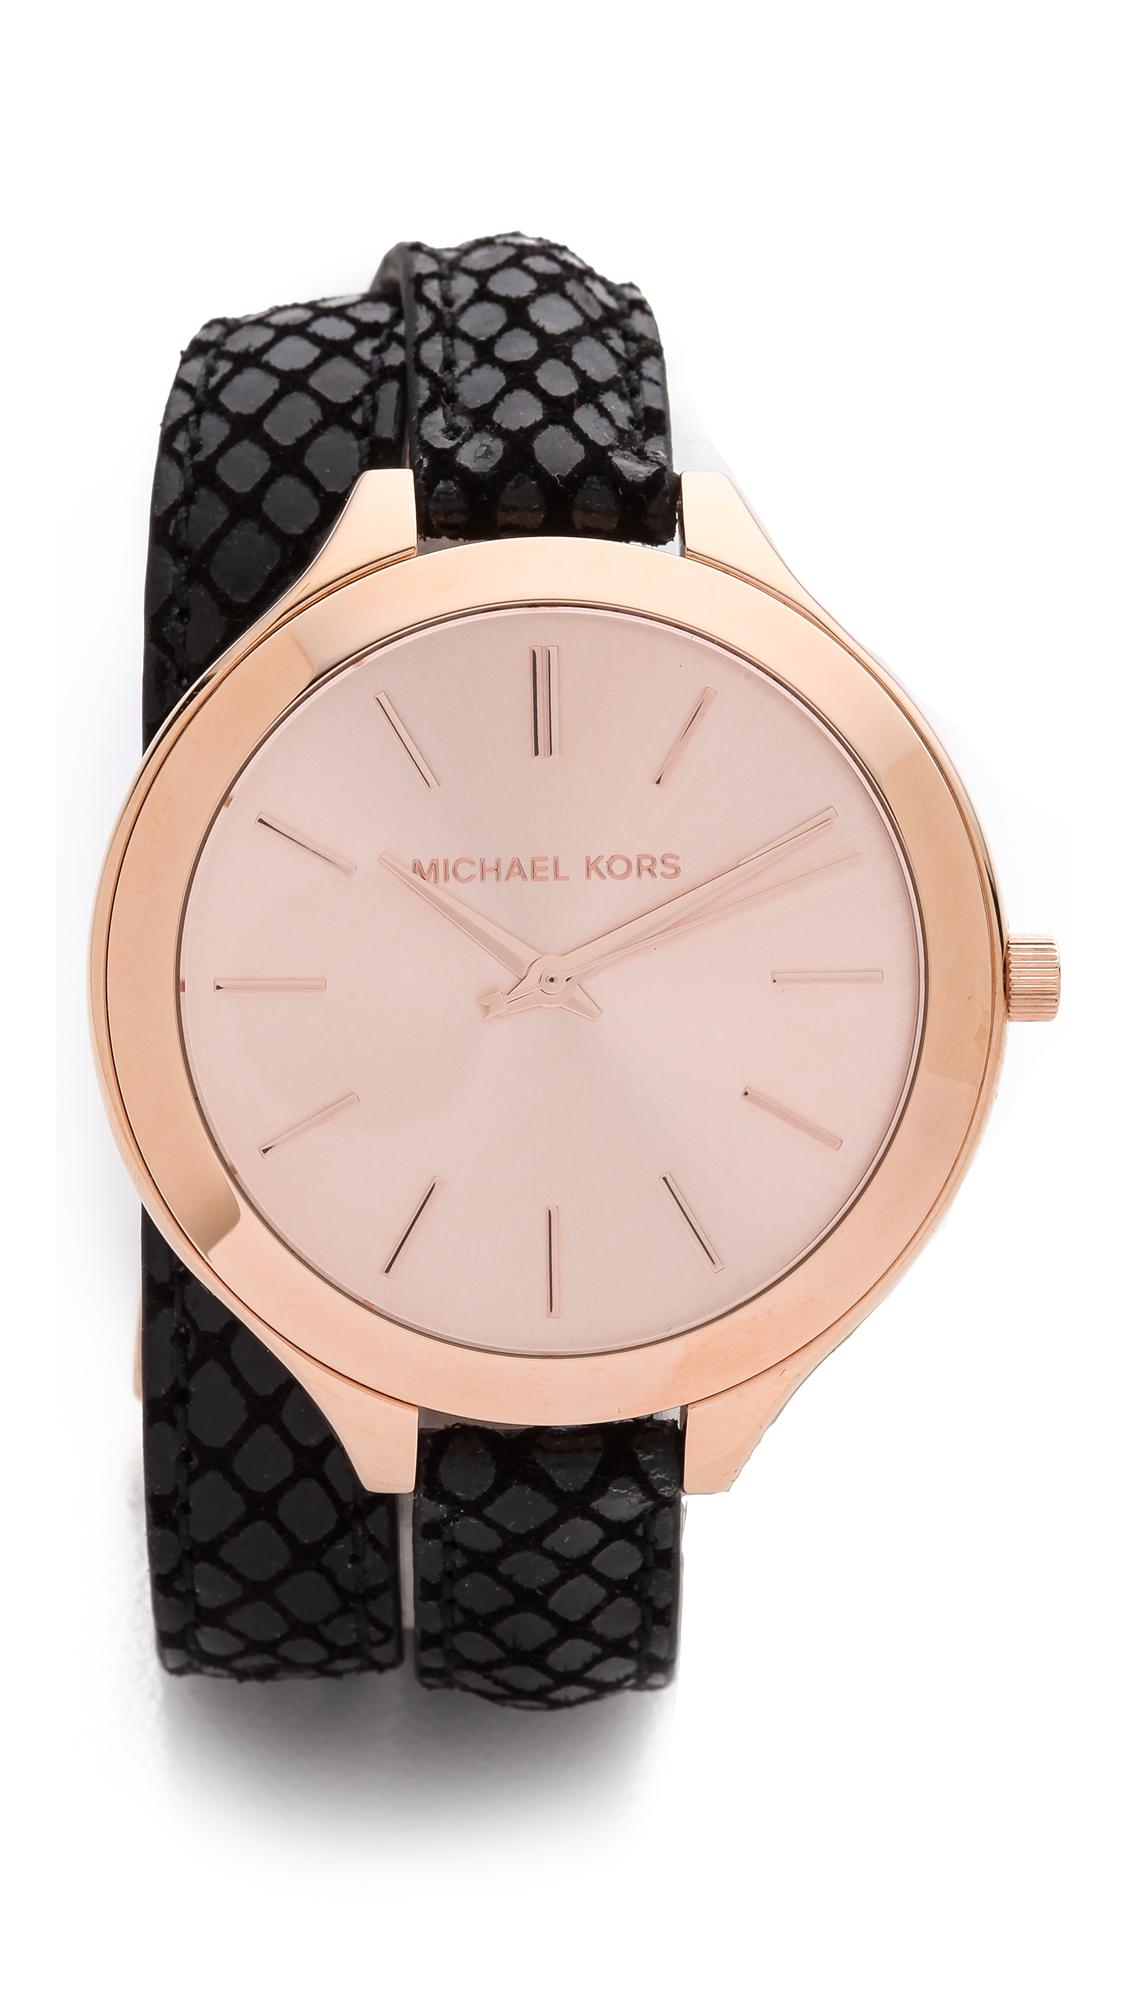 f52e05854dd3 Michael Kors Slim Runway Gold Tone Ladies Womens Wrist Watch MK3275.  Loading... Gallery